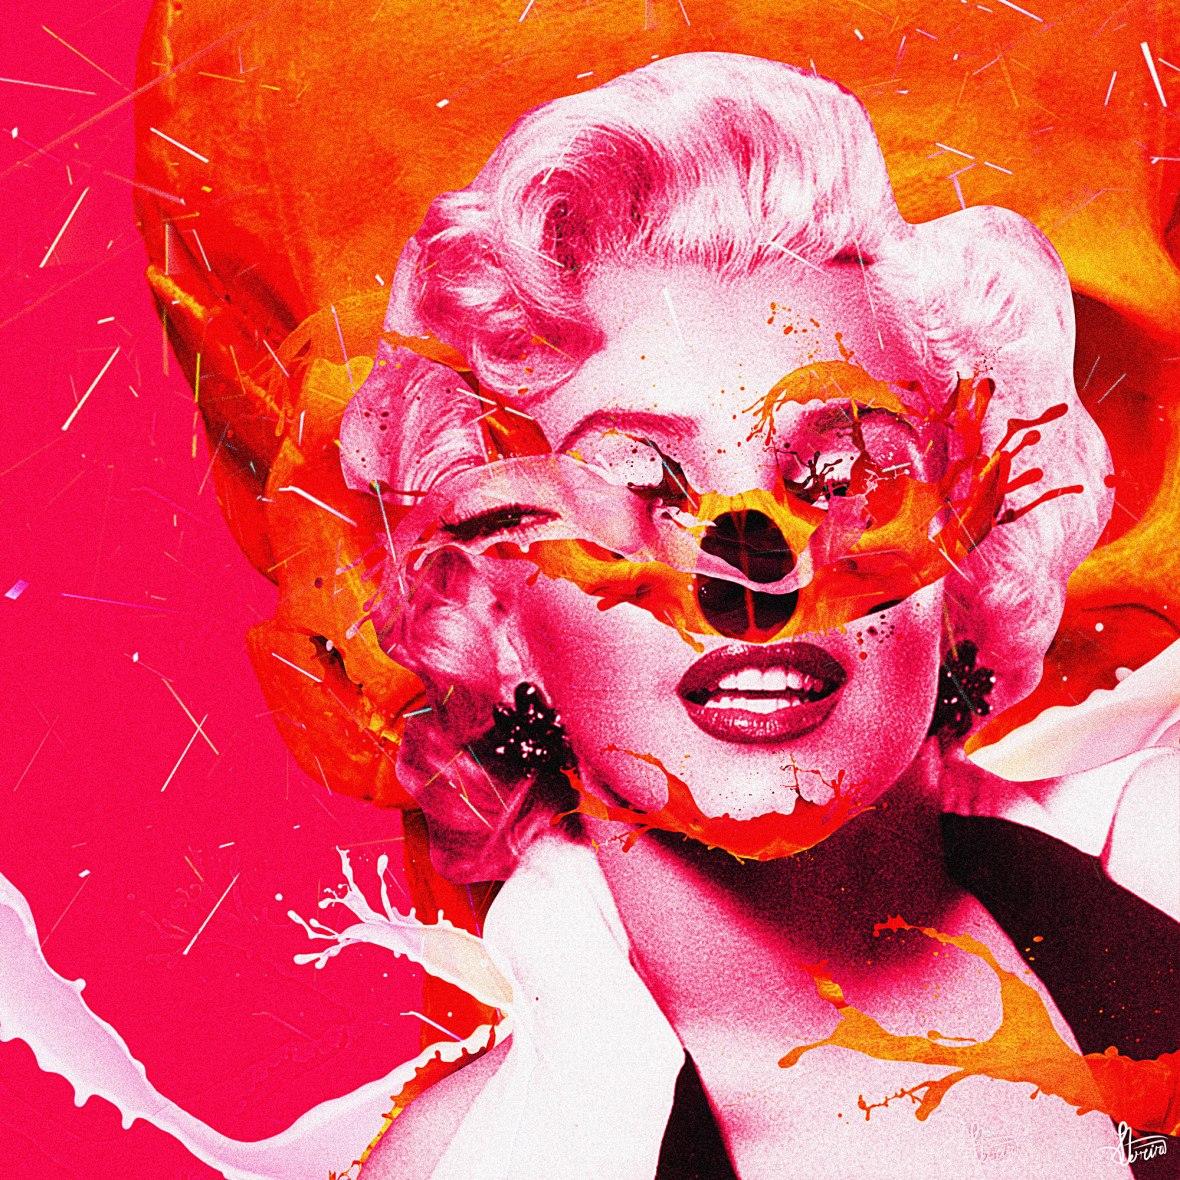 Marilyn-Monroe-Vision-web.jpg